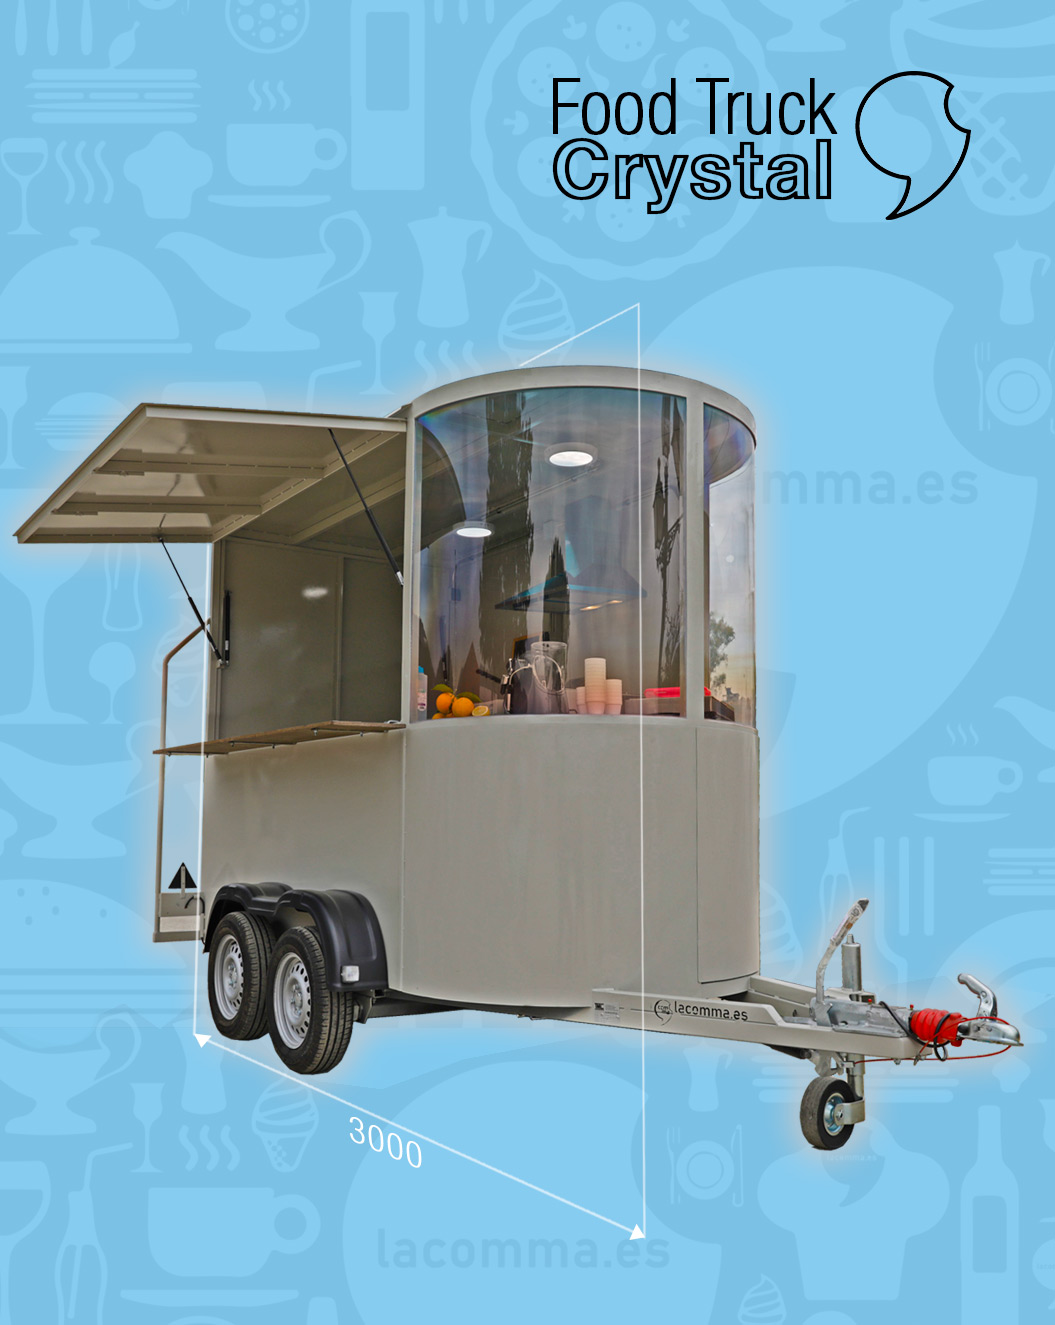 Foodtruck Crystal